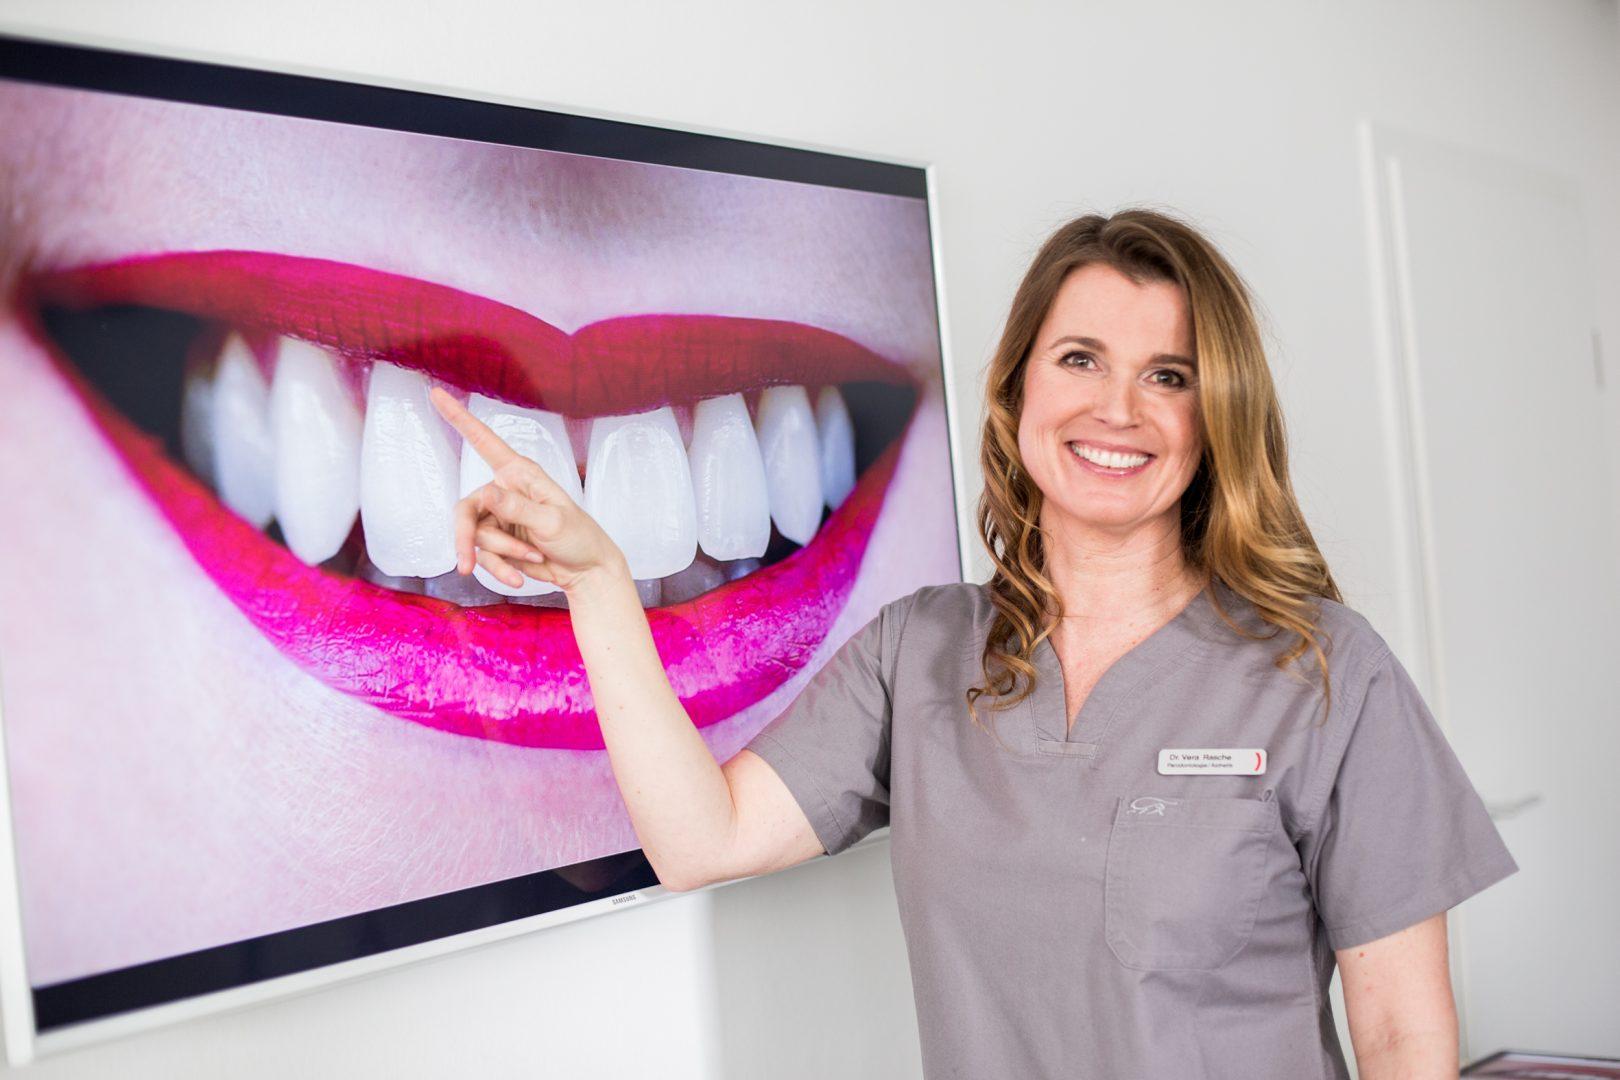 Zahnkultur Köln: Frau Dr. Rasche, Ästhetik in der Zahnmedizin